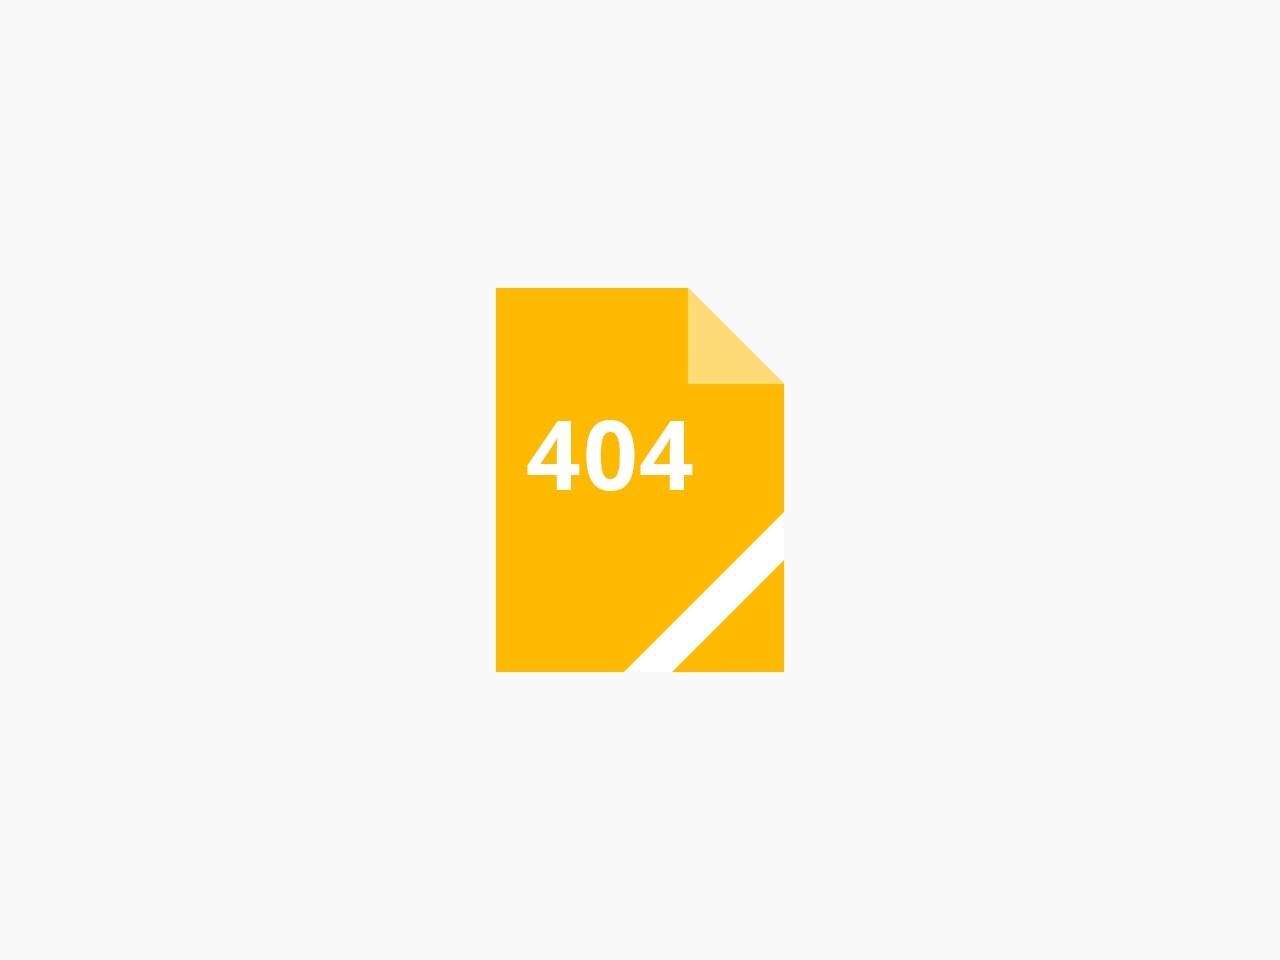 国家电网有限公司STATE GRID Corporation of China